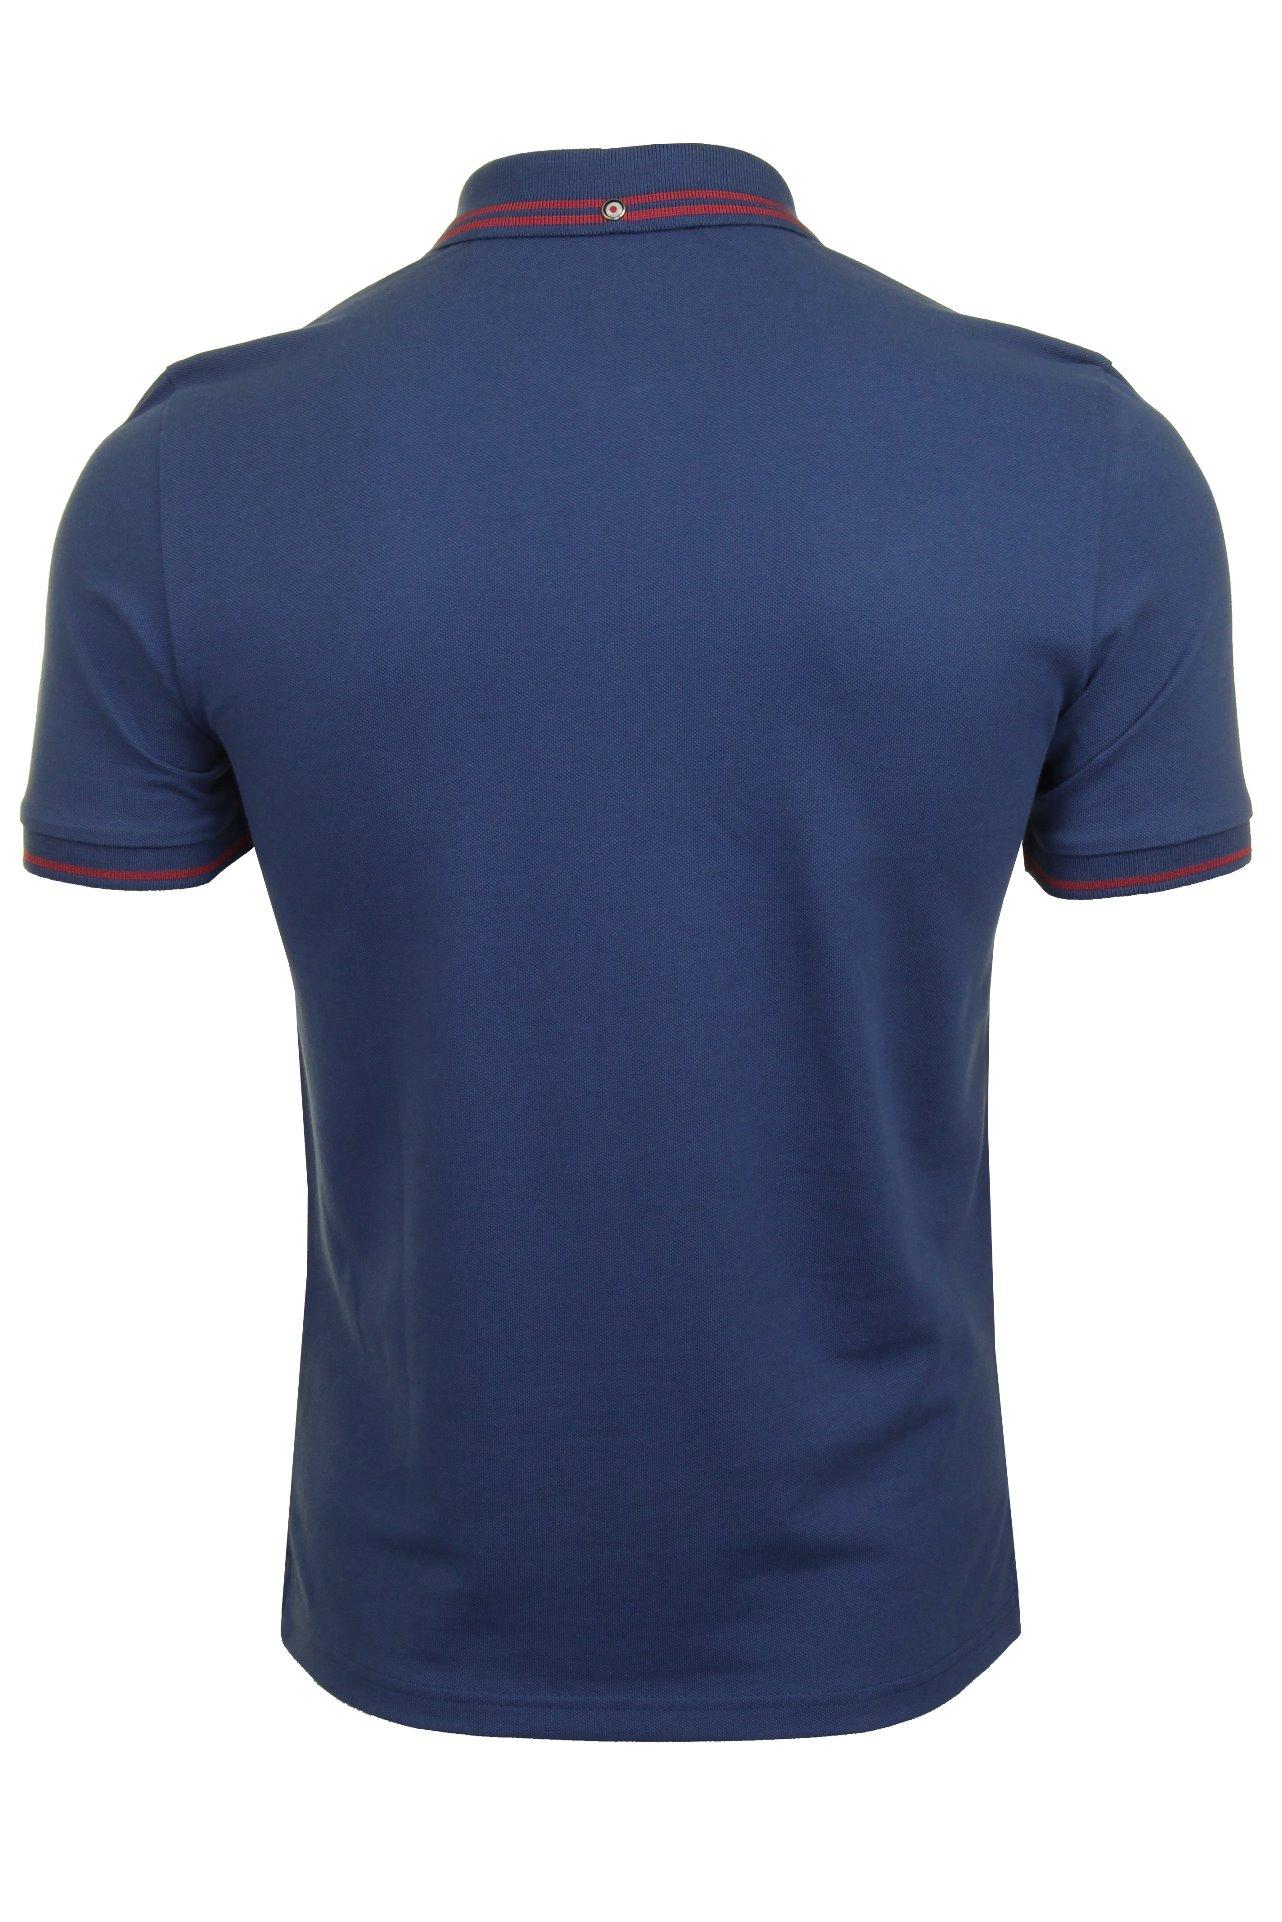 876748c51a4 Mens-Tipped-Pique-Polo-Shirt-by-Ben-Sherman thumbnail